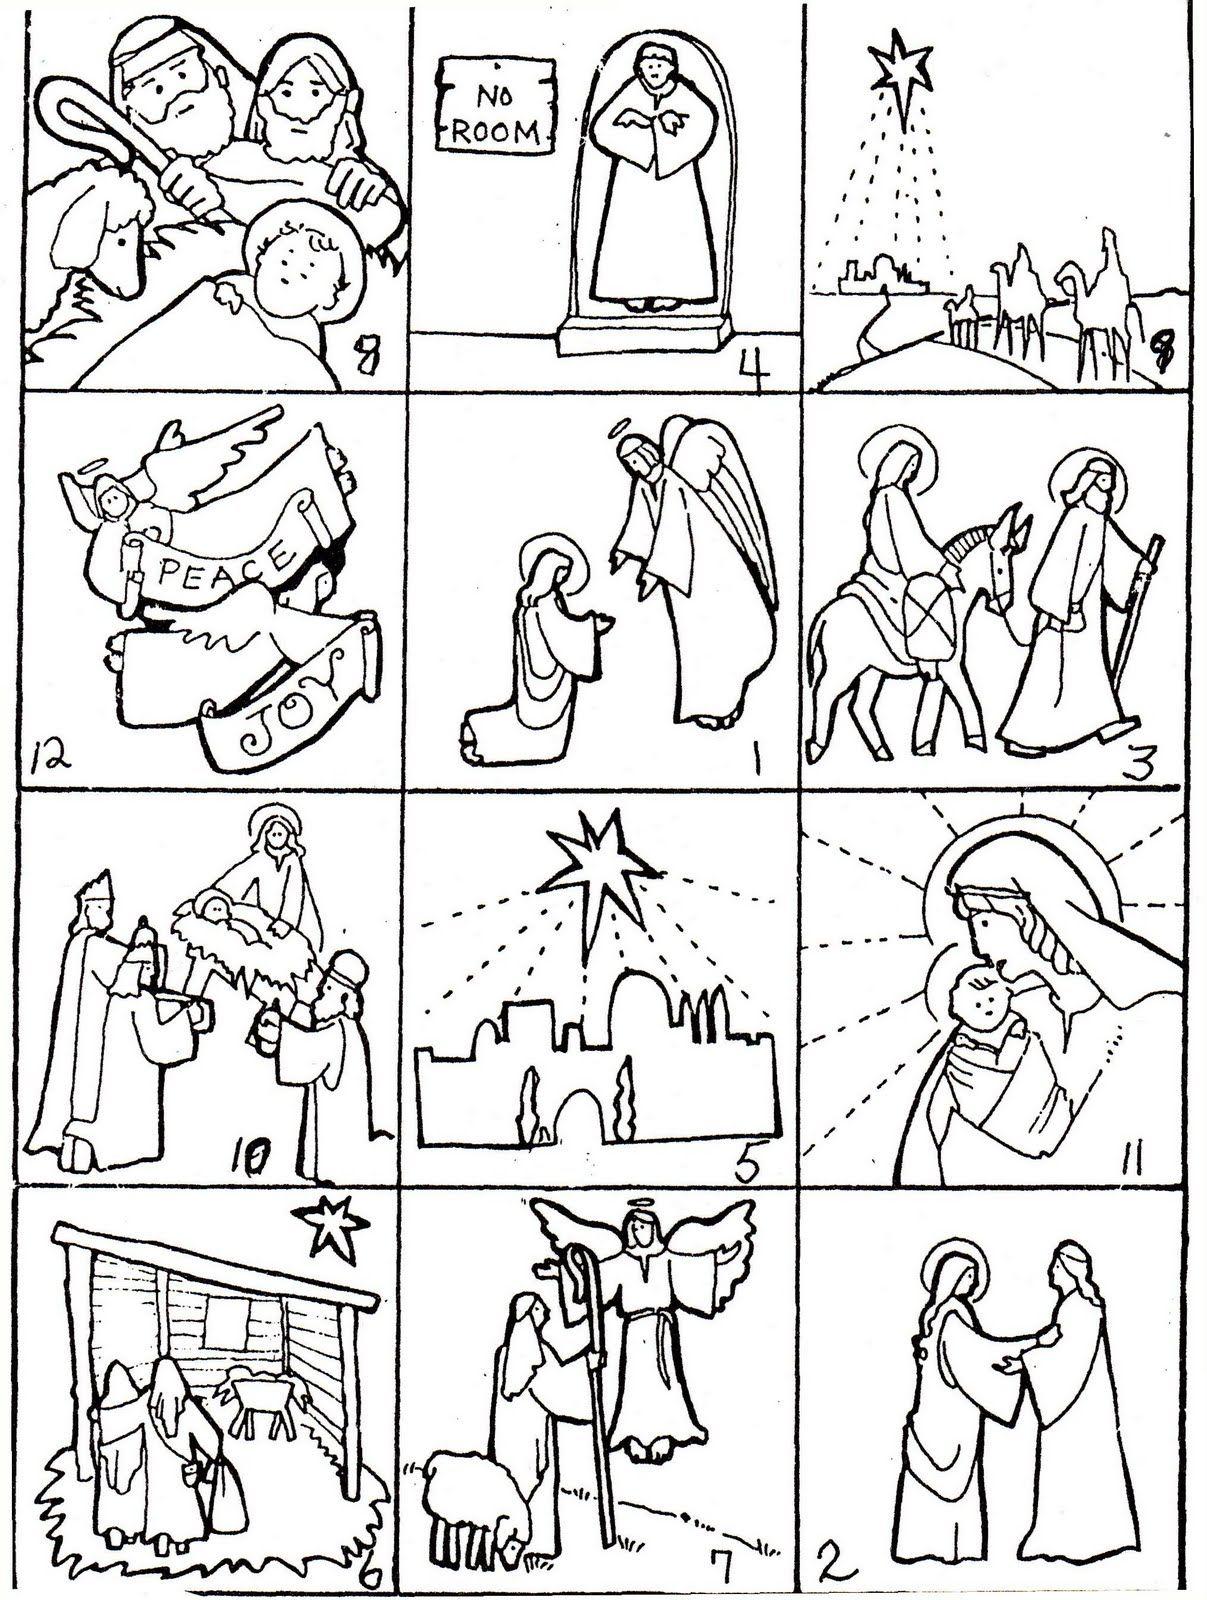 ELEMENTARY SCHOOL ENRICHMENT ACTIVITIES: CHRISTMAS STORY ...